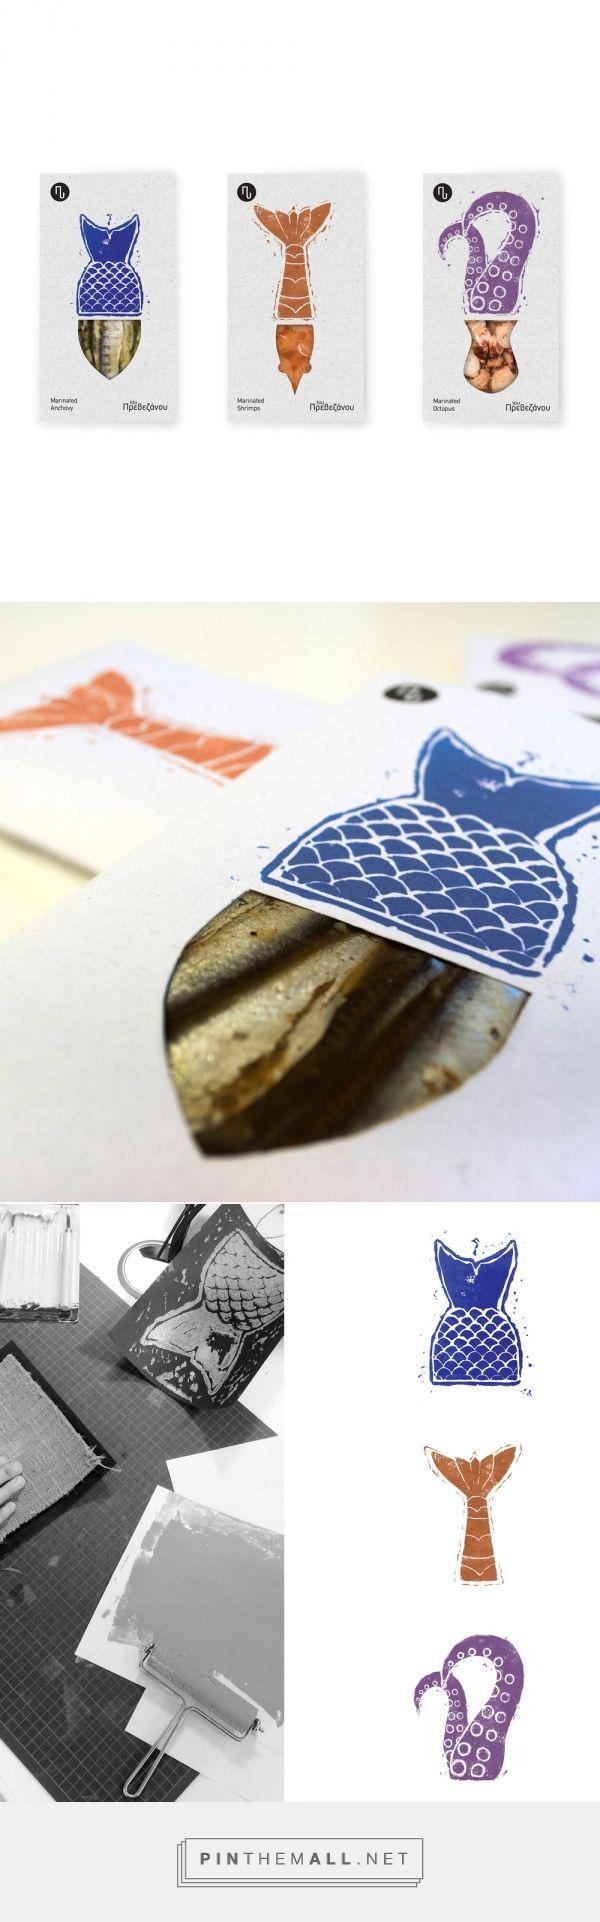 TOU PREVEZANOU — The Dieline - Branding & Packaging. If you like UX, design…